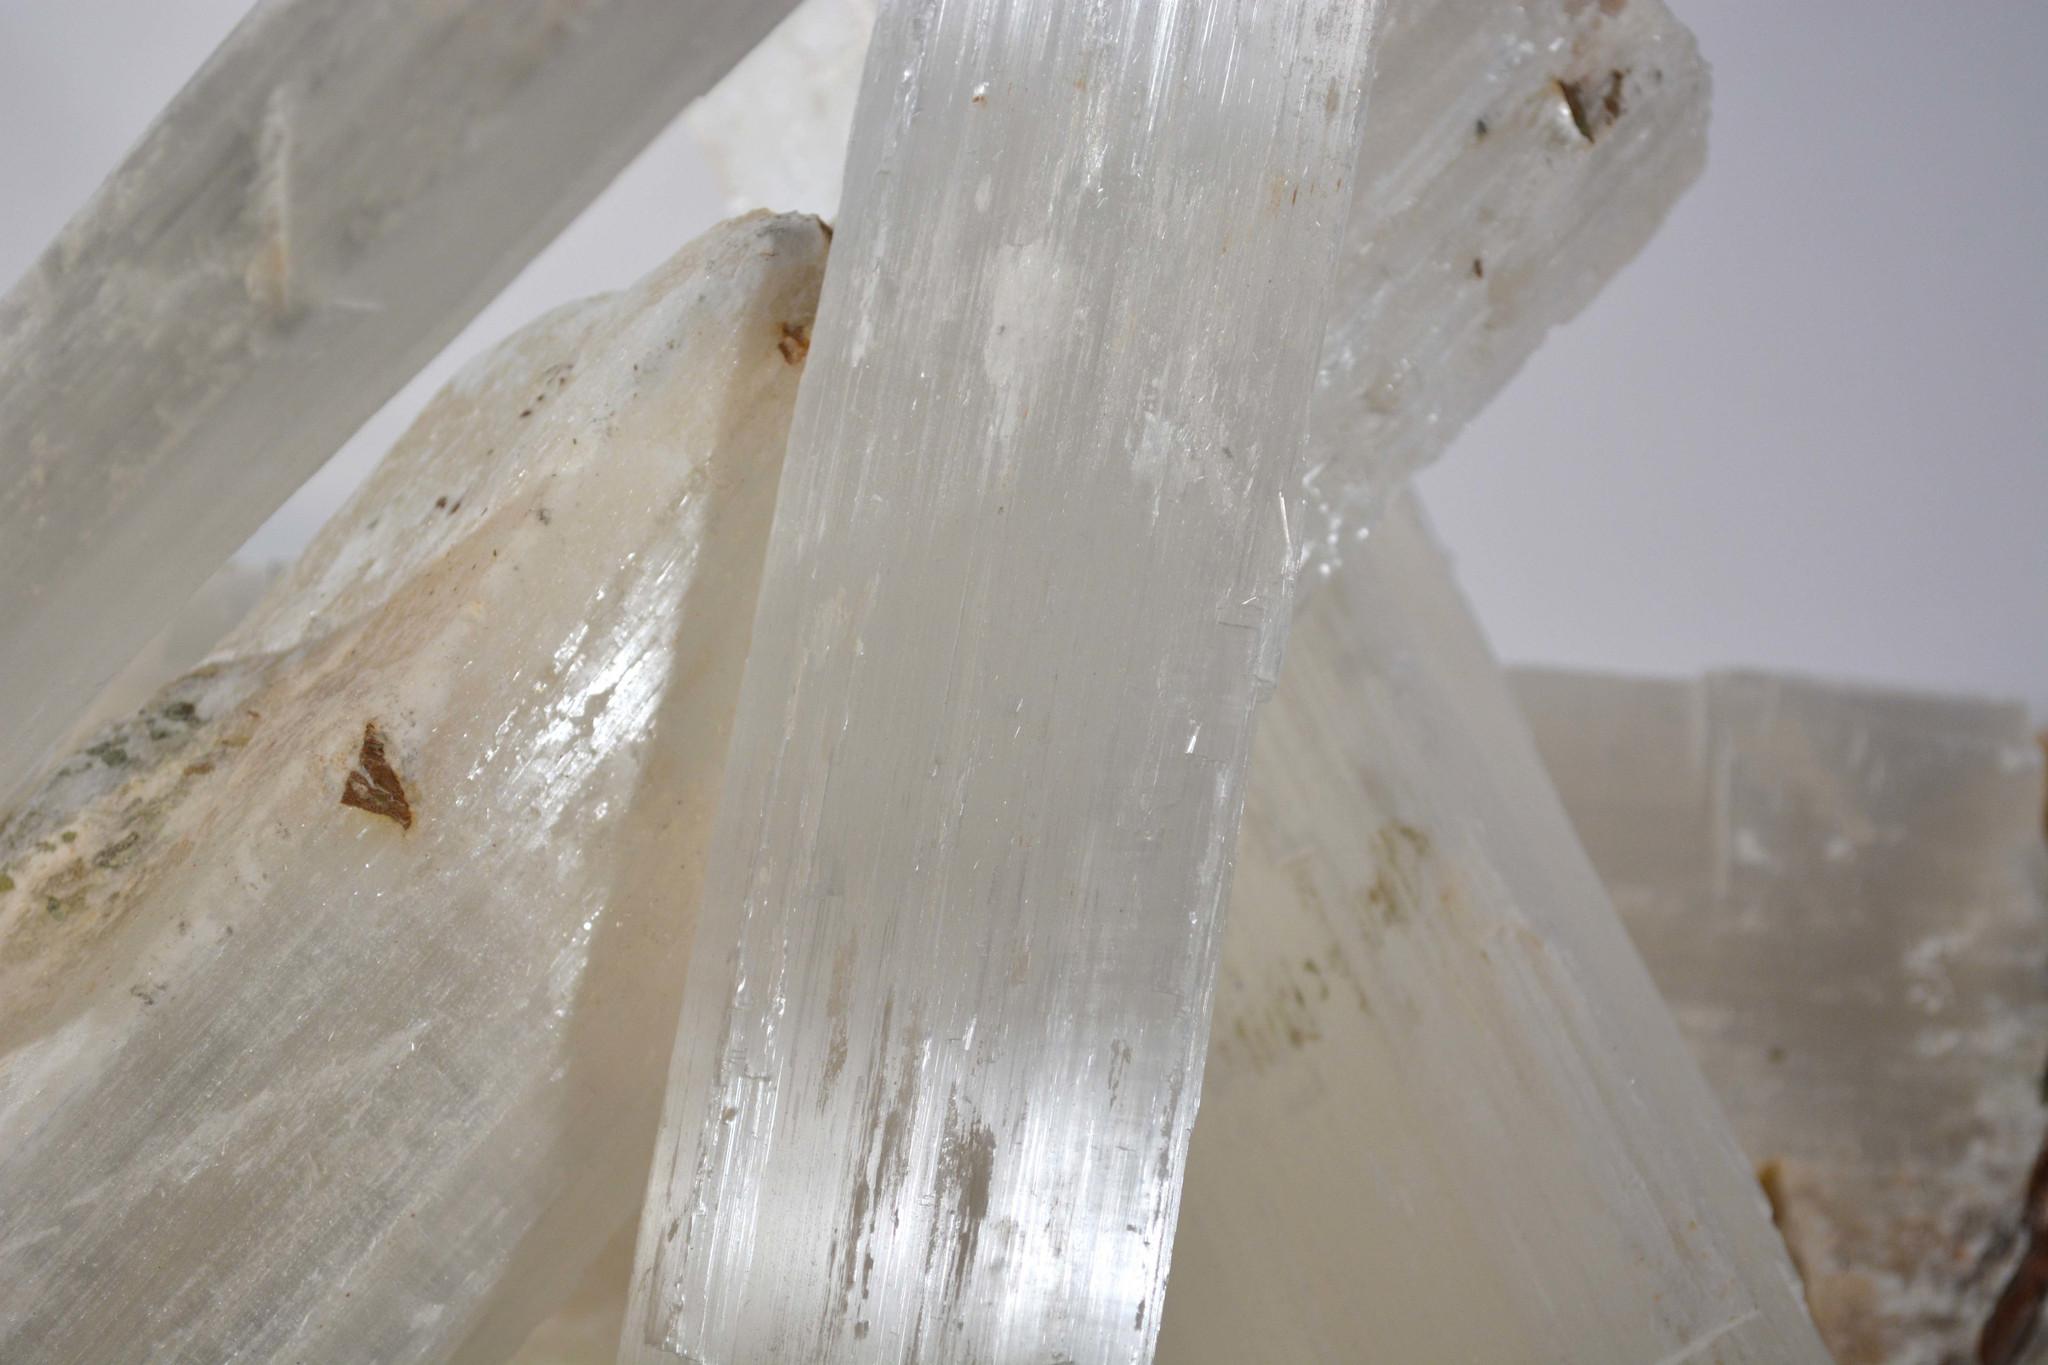 white selenite crystal quartz transluscent set of 3 fireplace logs clear